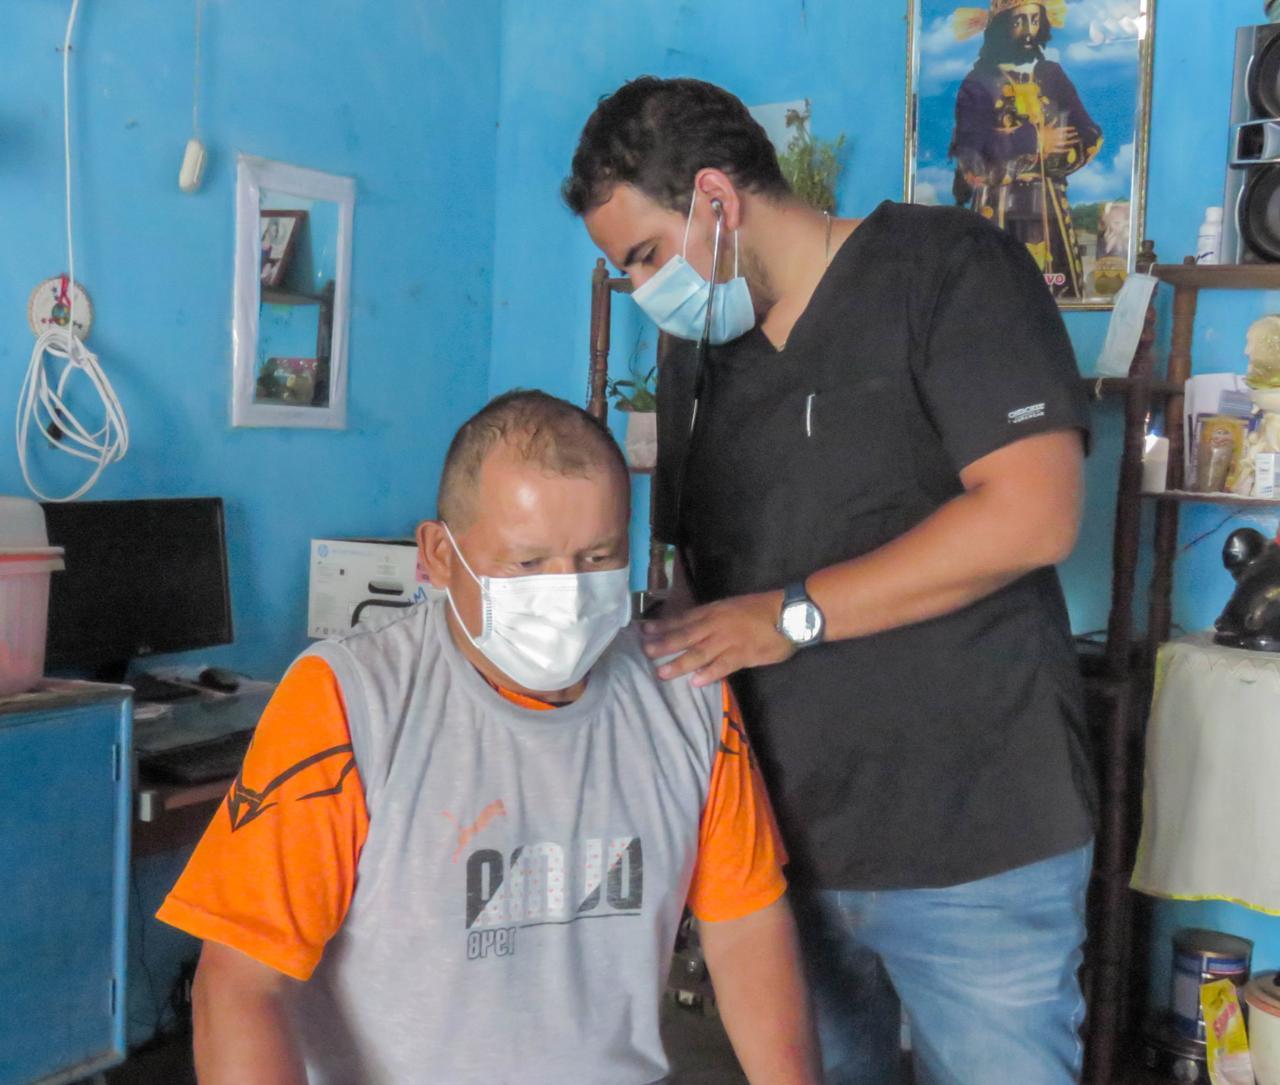 Essalud - EsSalud Tumbes realizó catorce mil atenciones domiciliarias durante pandemia